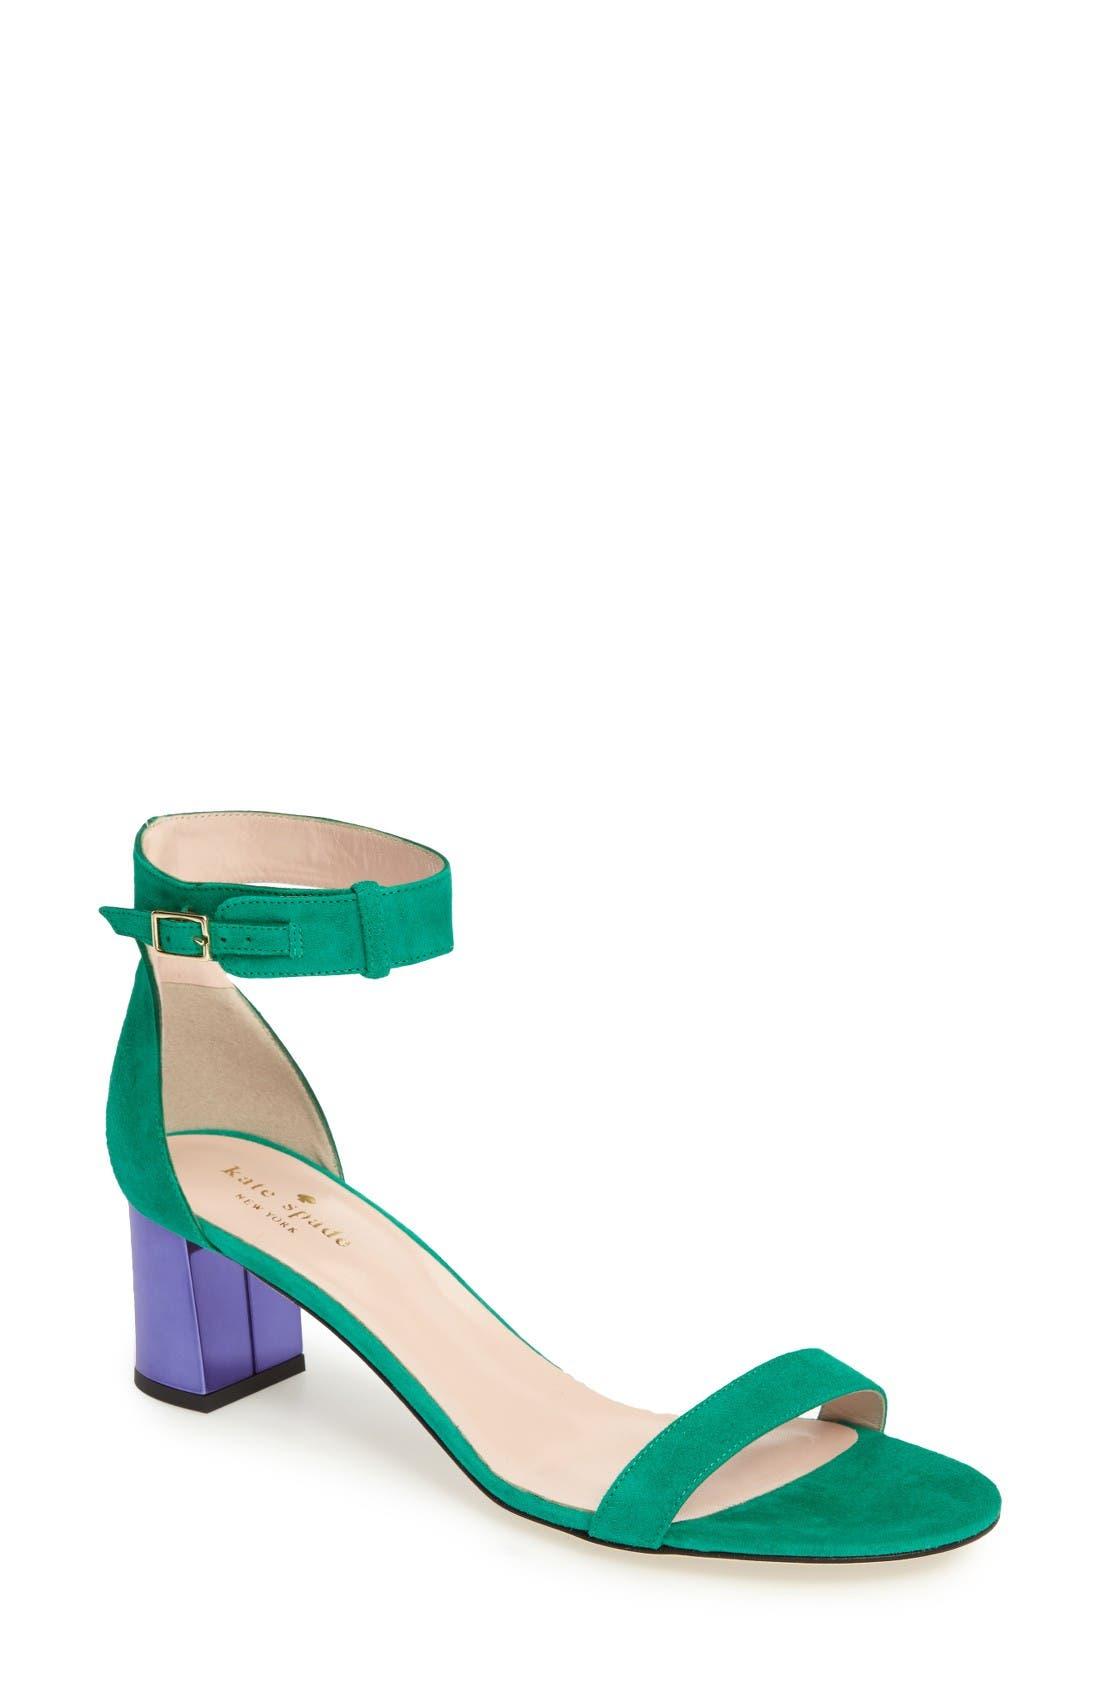 Alternate Image 1 Selected - kate spade new york menorca ankle strap sandal (Women)